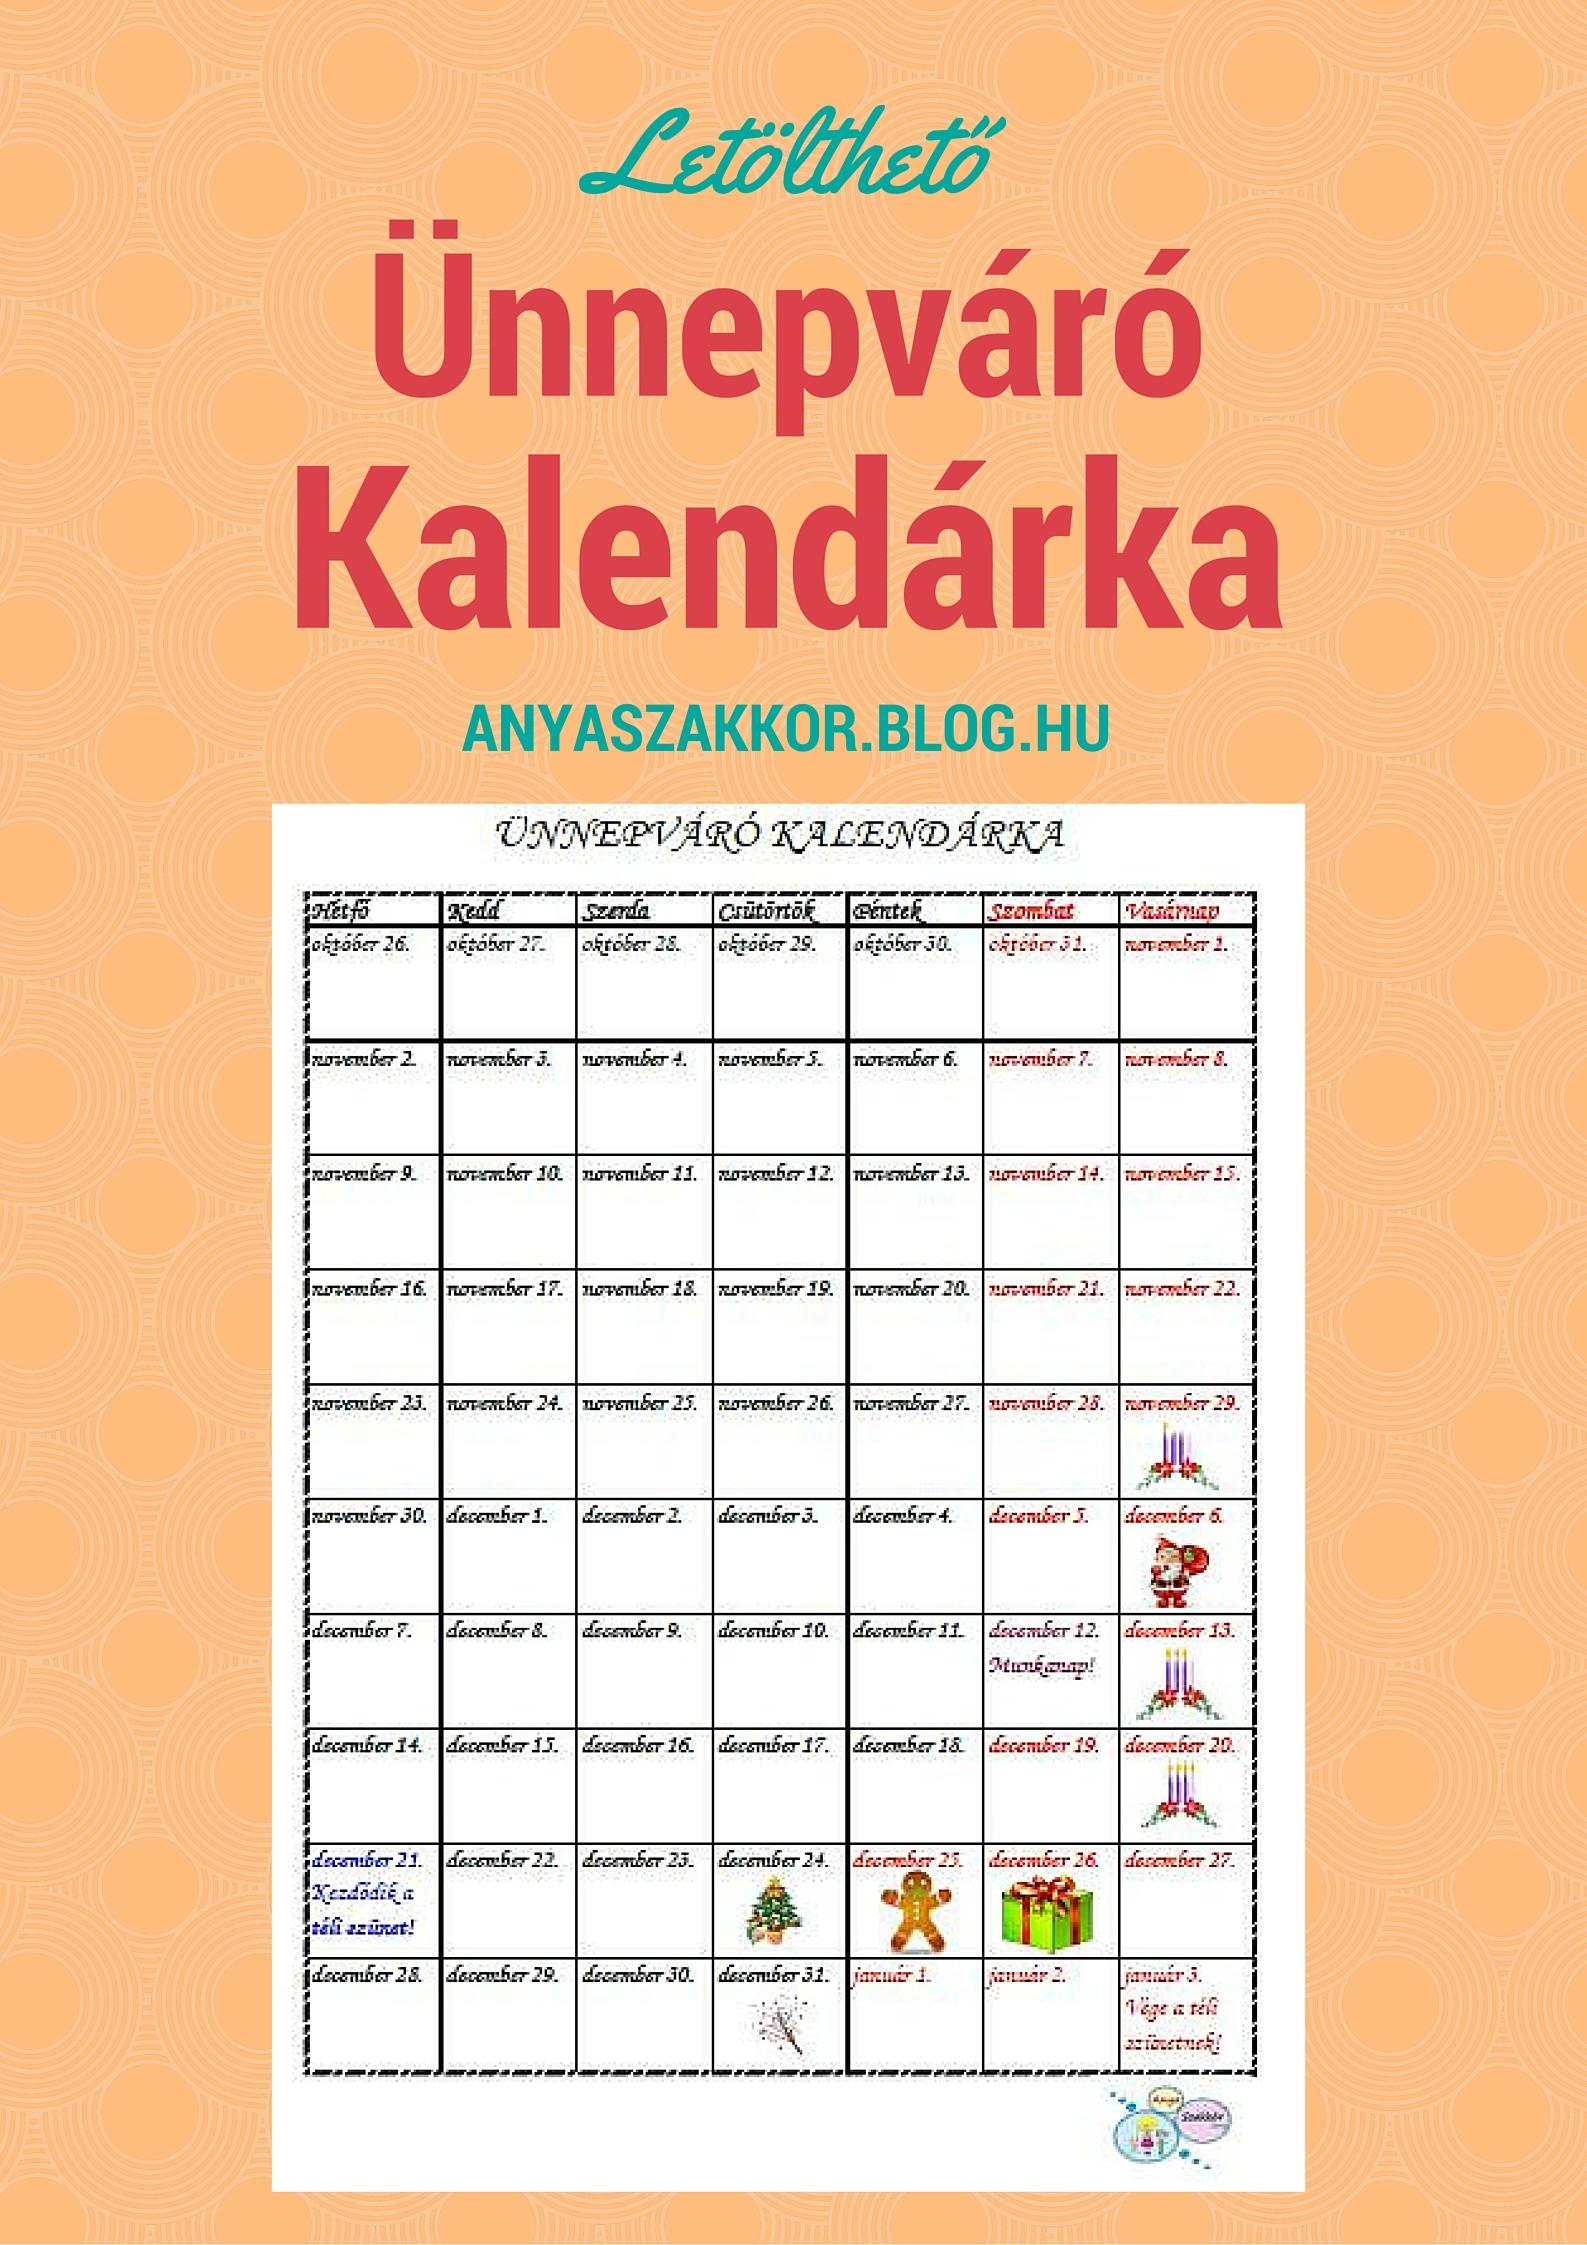 letoltheto_unnepvaro_kalendarka.jpg